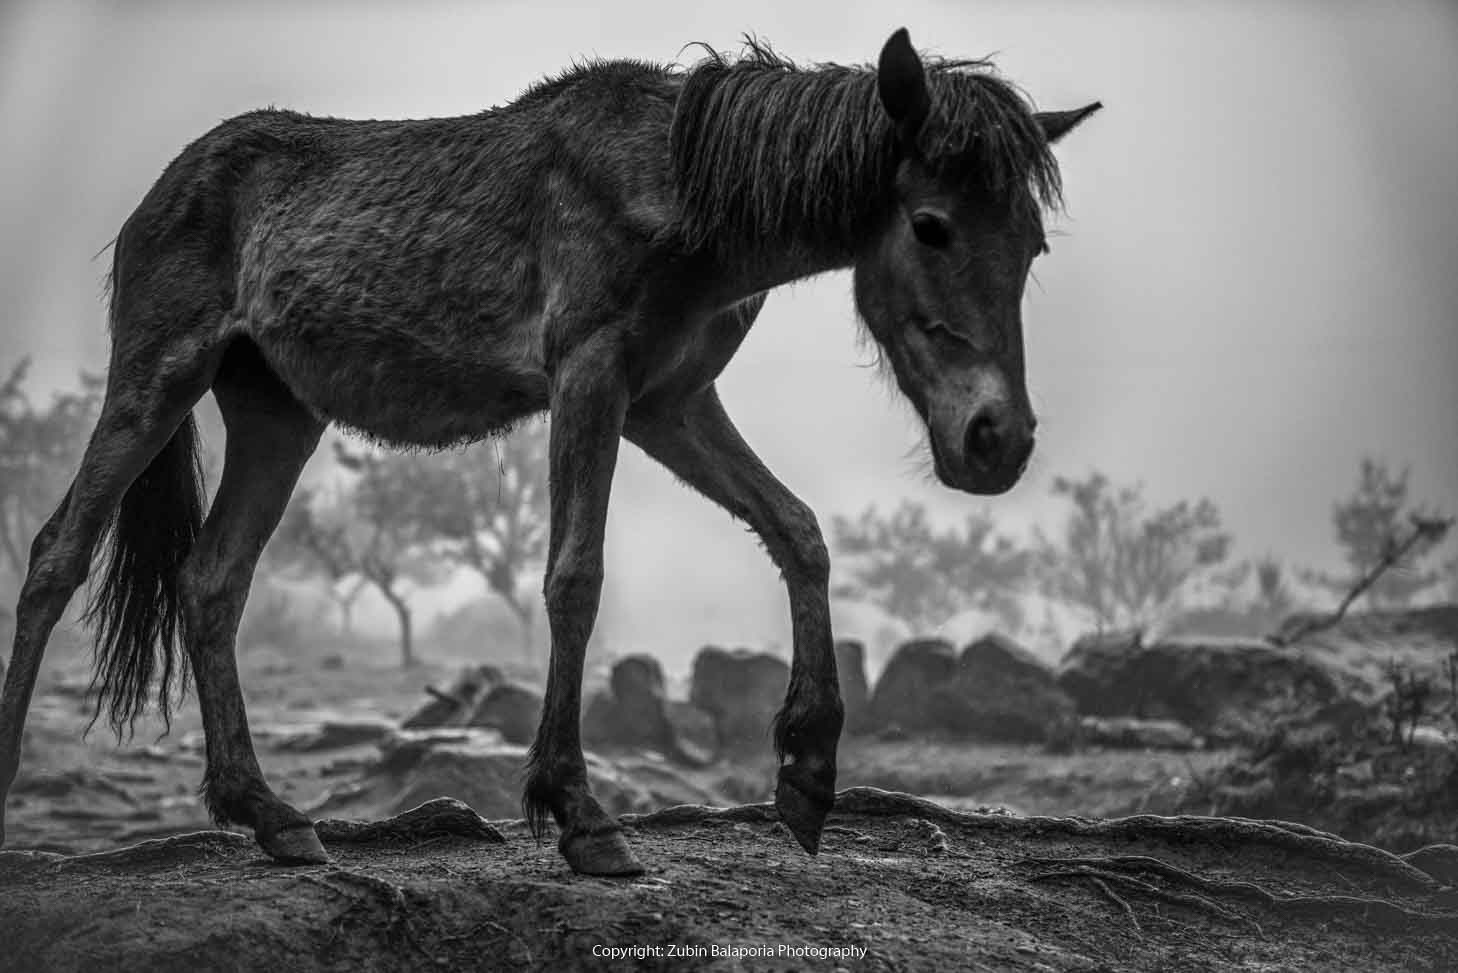 BHU Tan Pony 07 BW 01.jpg